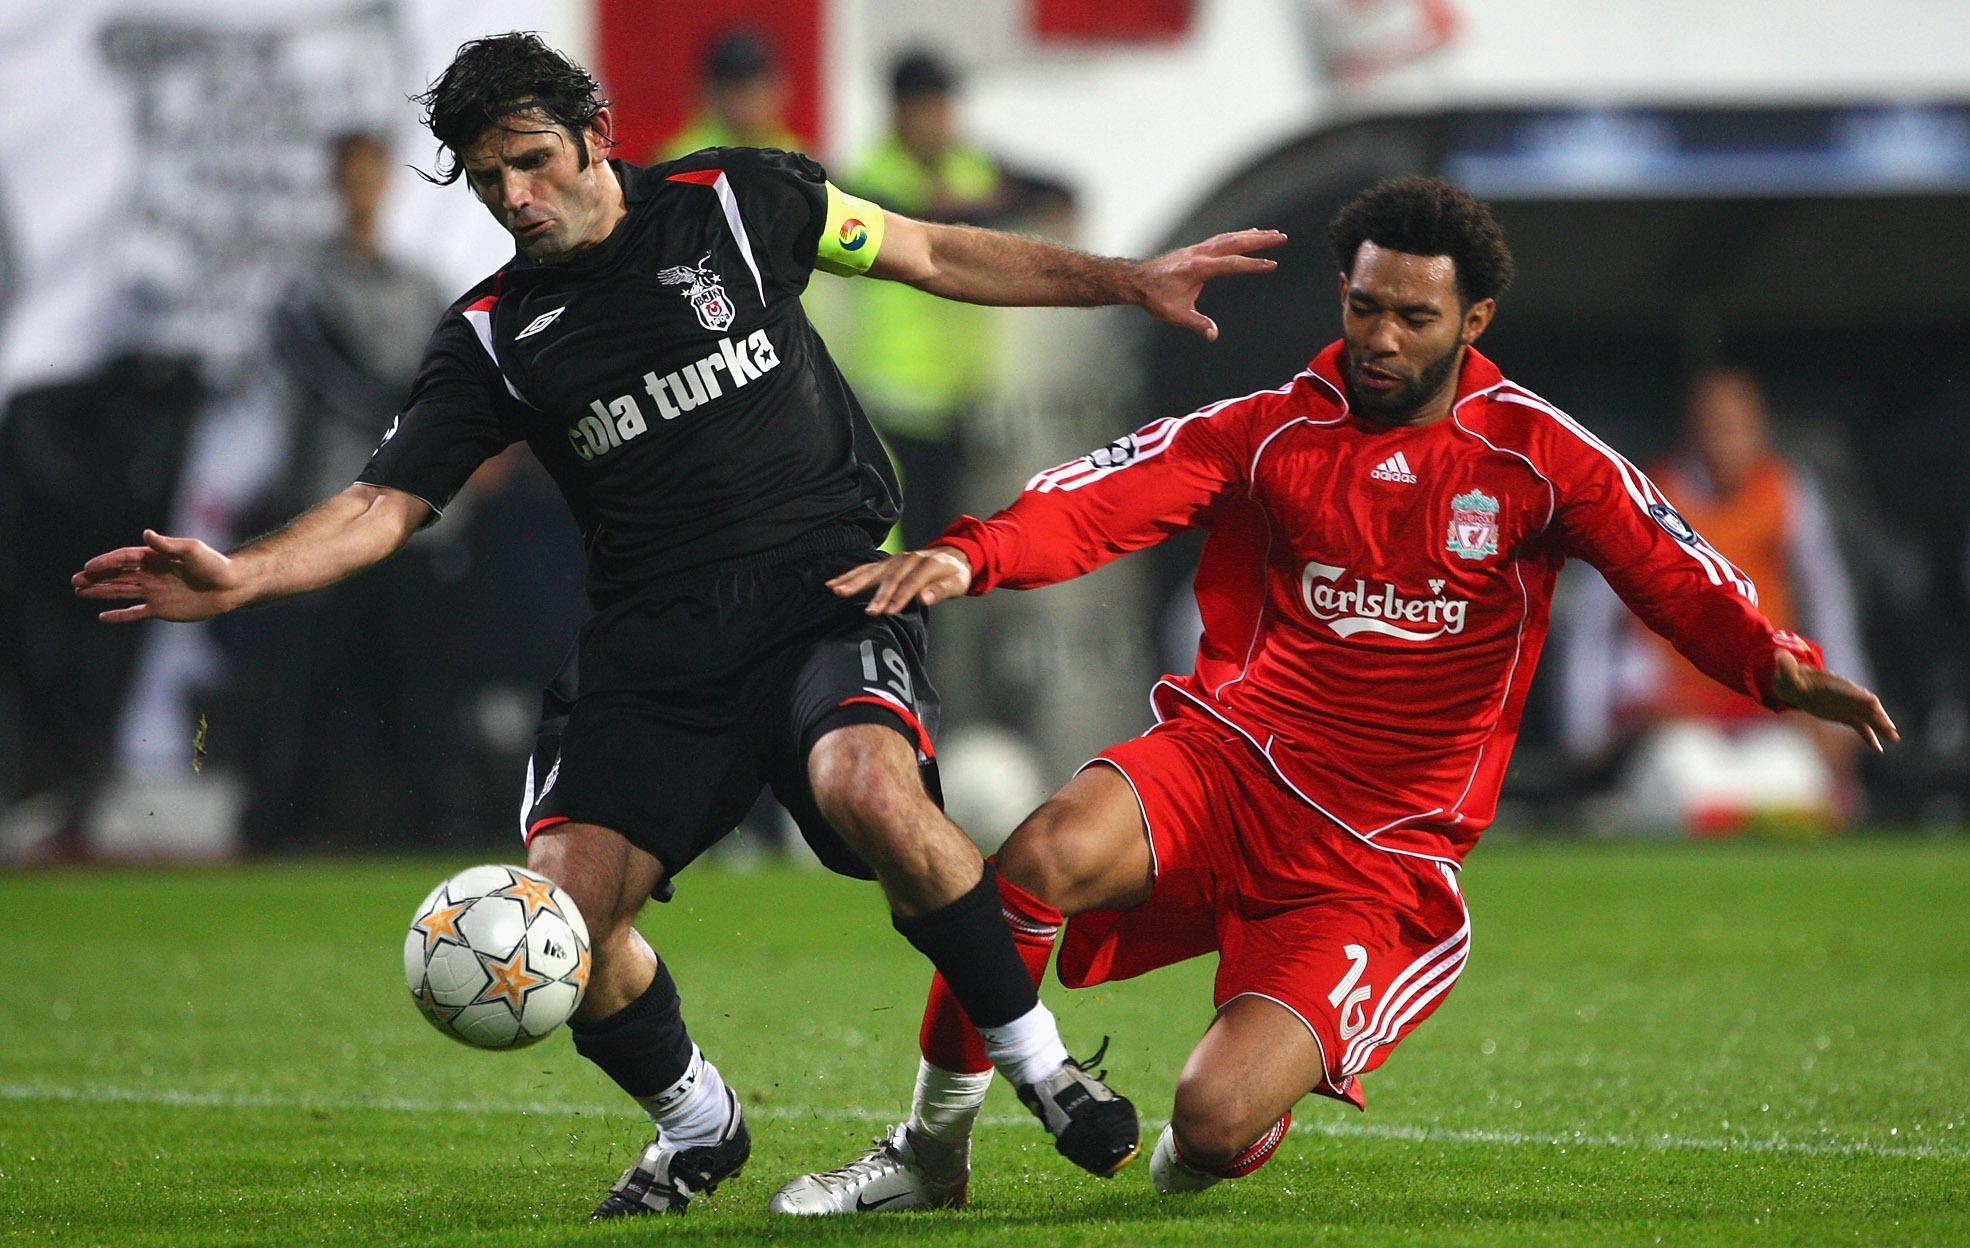 TARİHTE BUGÜN | Beşiktaş, Liverpool'u mağlup etti